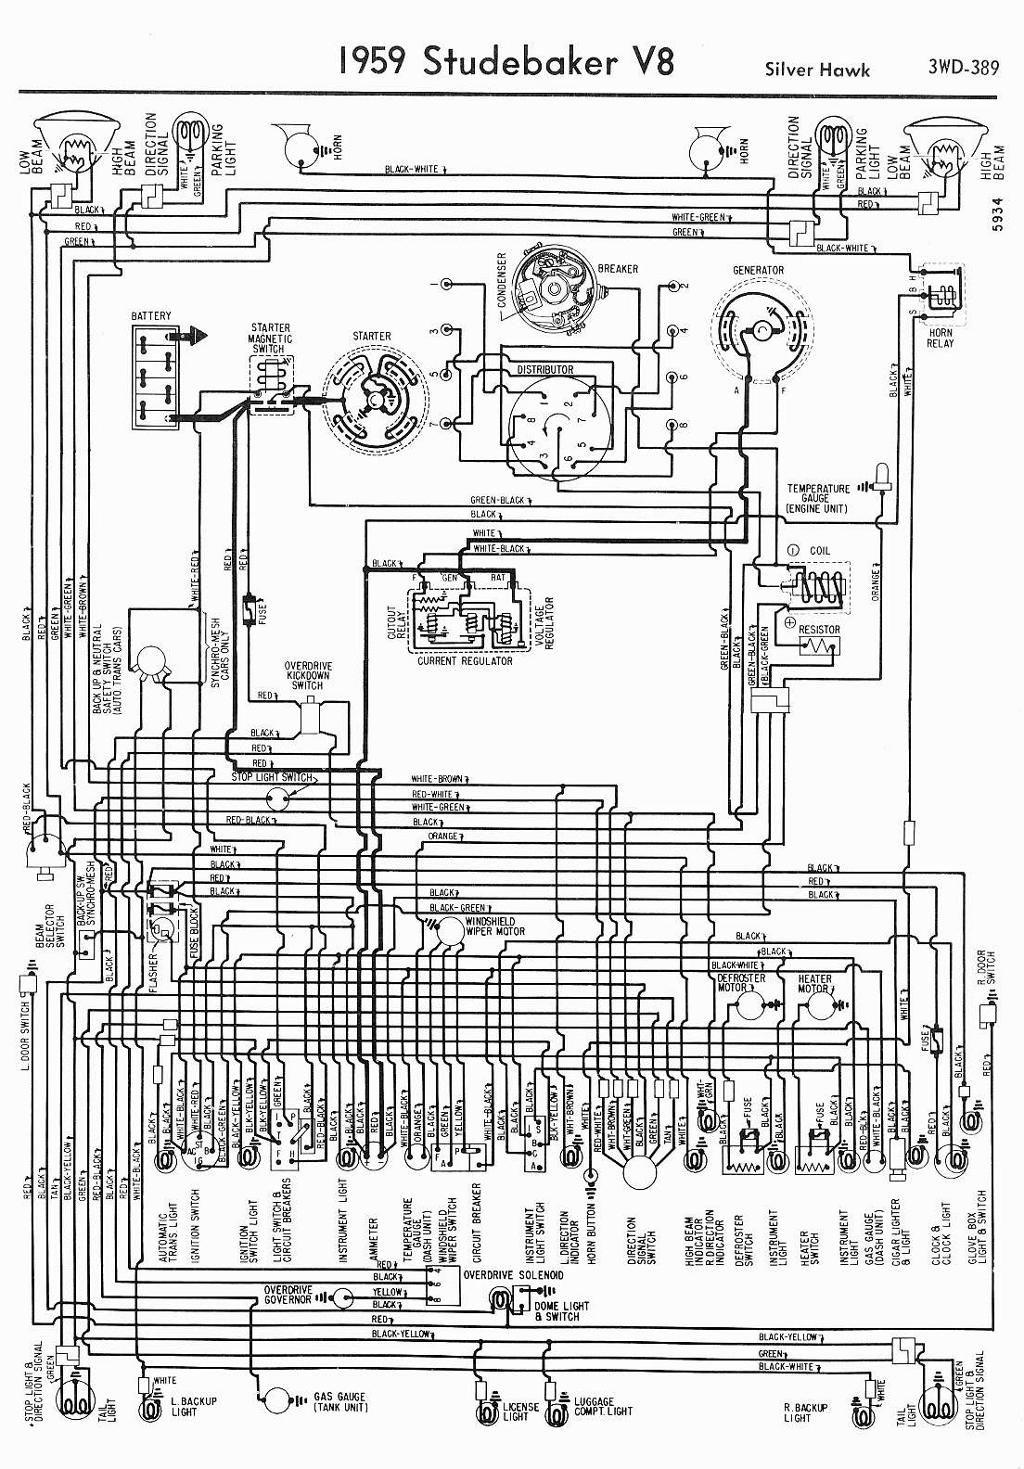 medium resolution of studebaker engine diagrams wiring diagram data val related image studebaker blueprints drawings diagram 1954